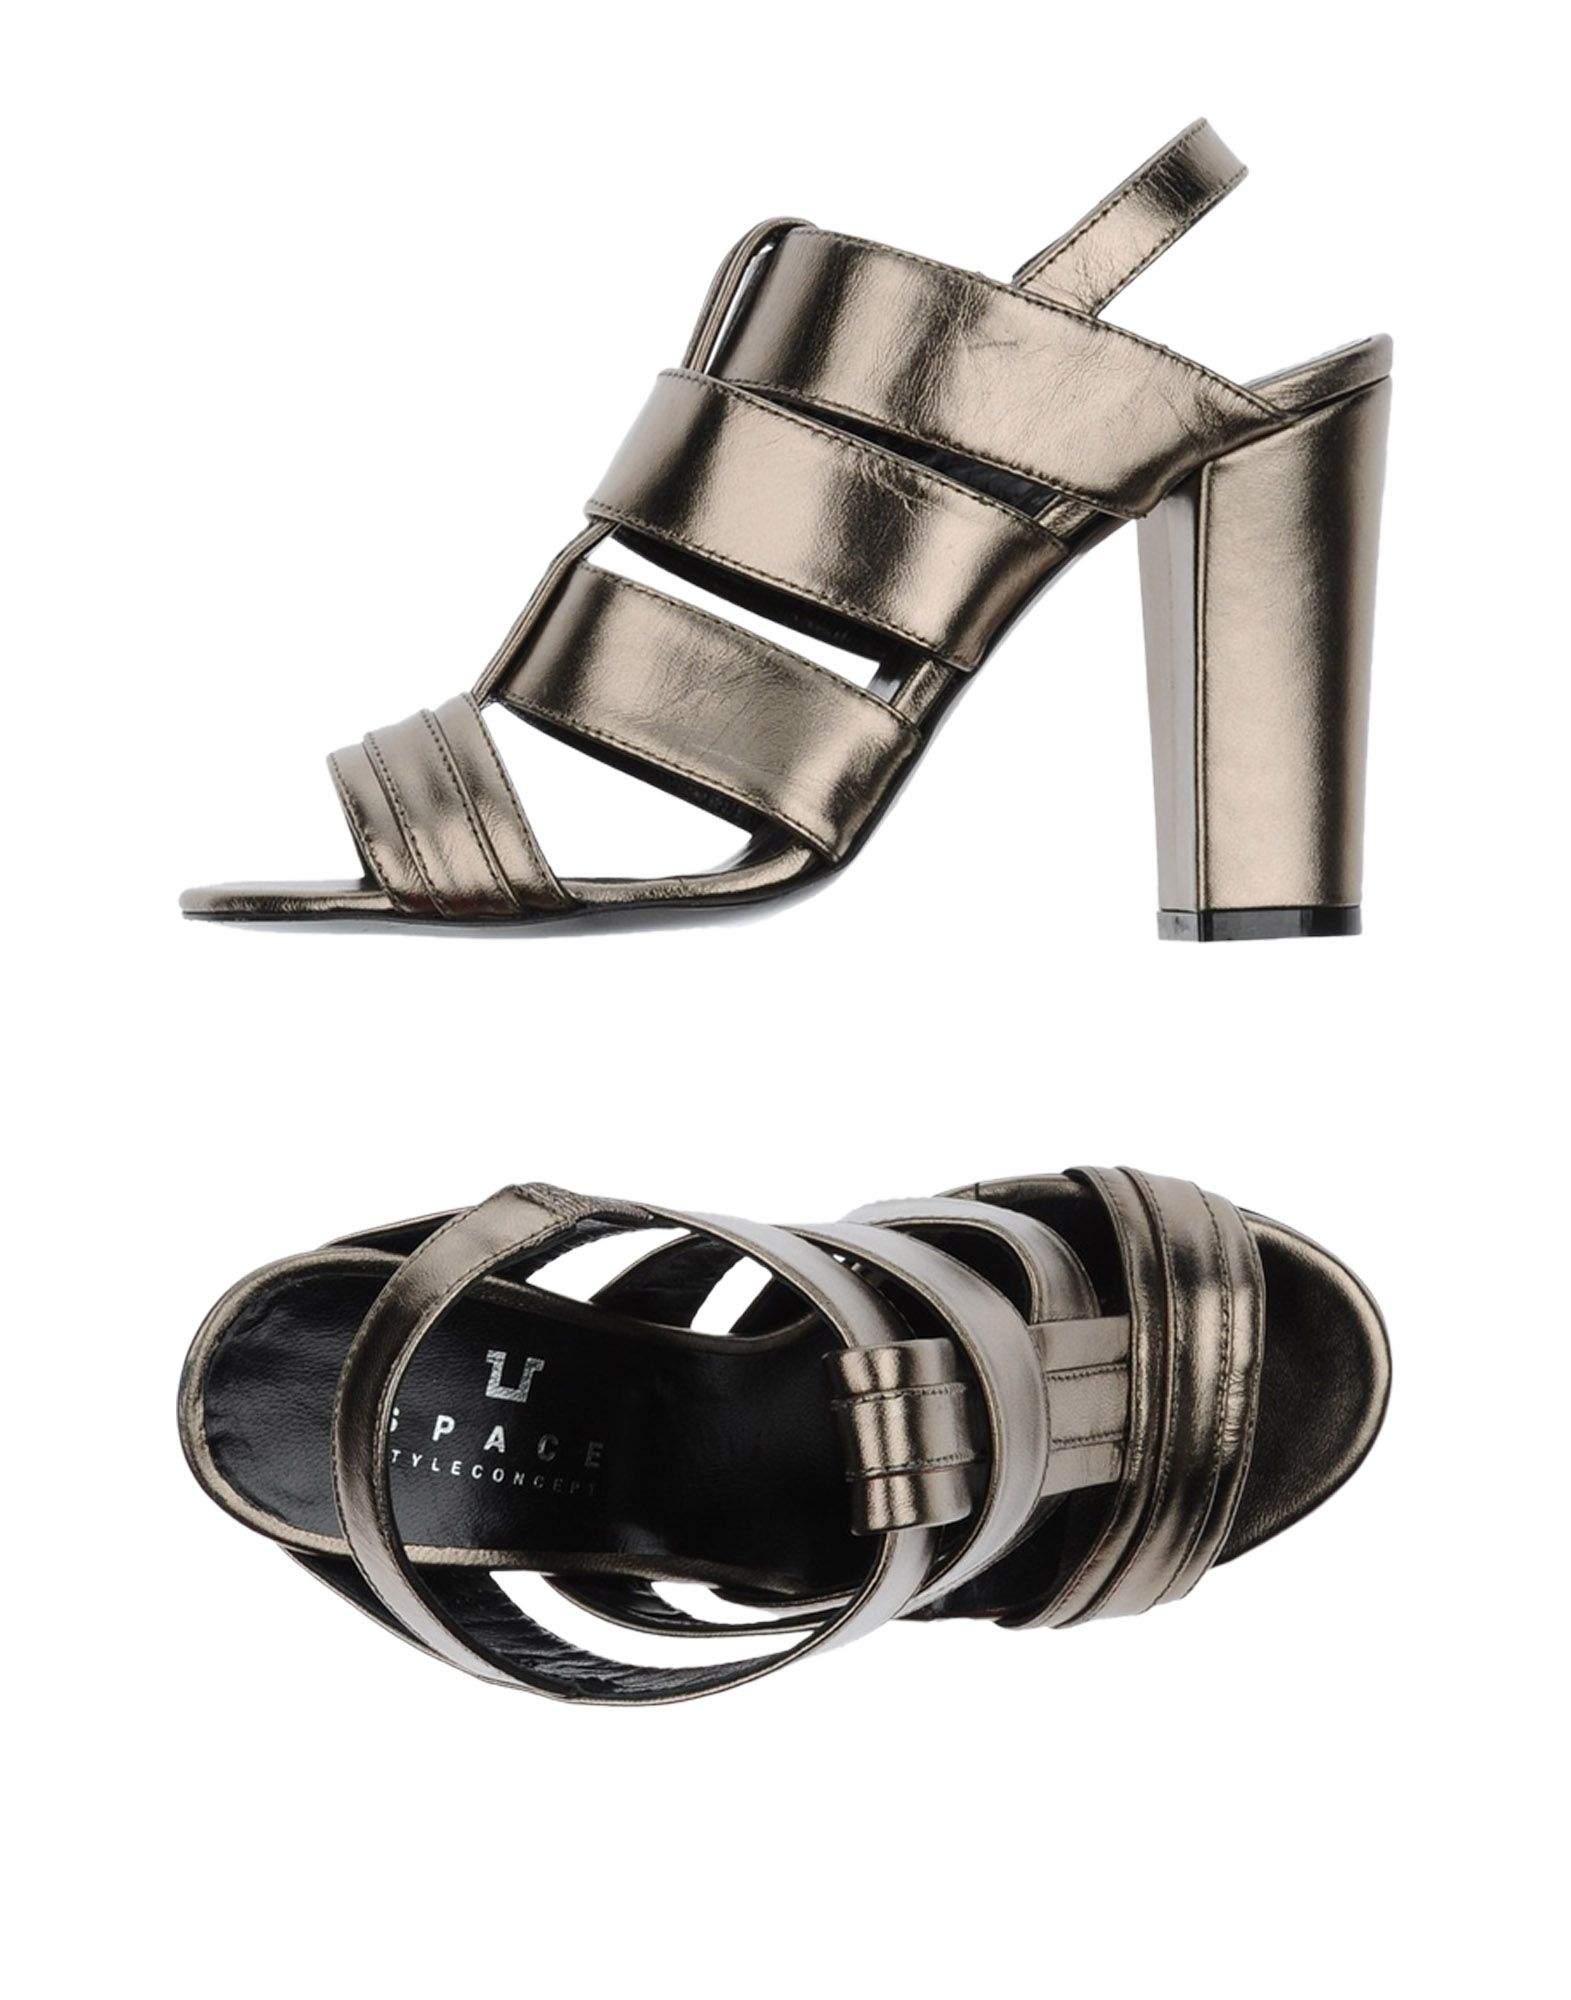 Space Style Concept Sandals   Women Space Style Concept Sandals   44990871